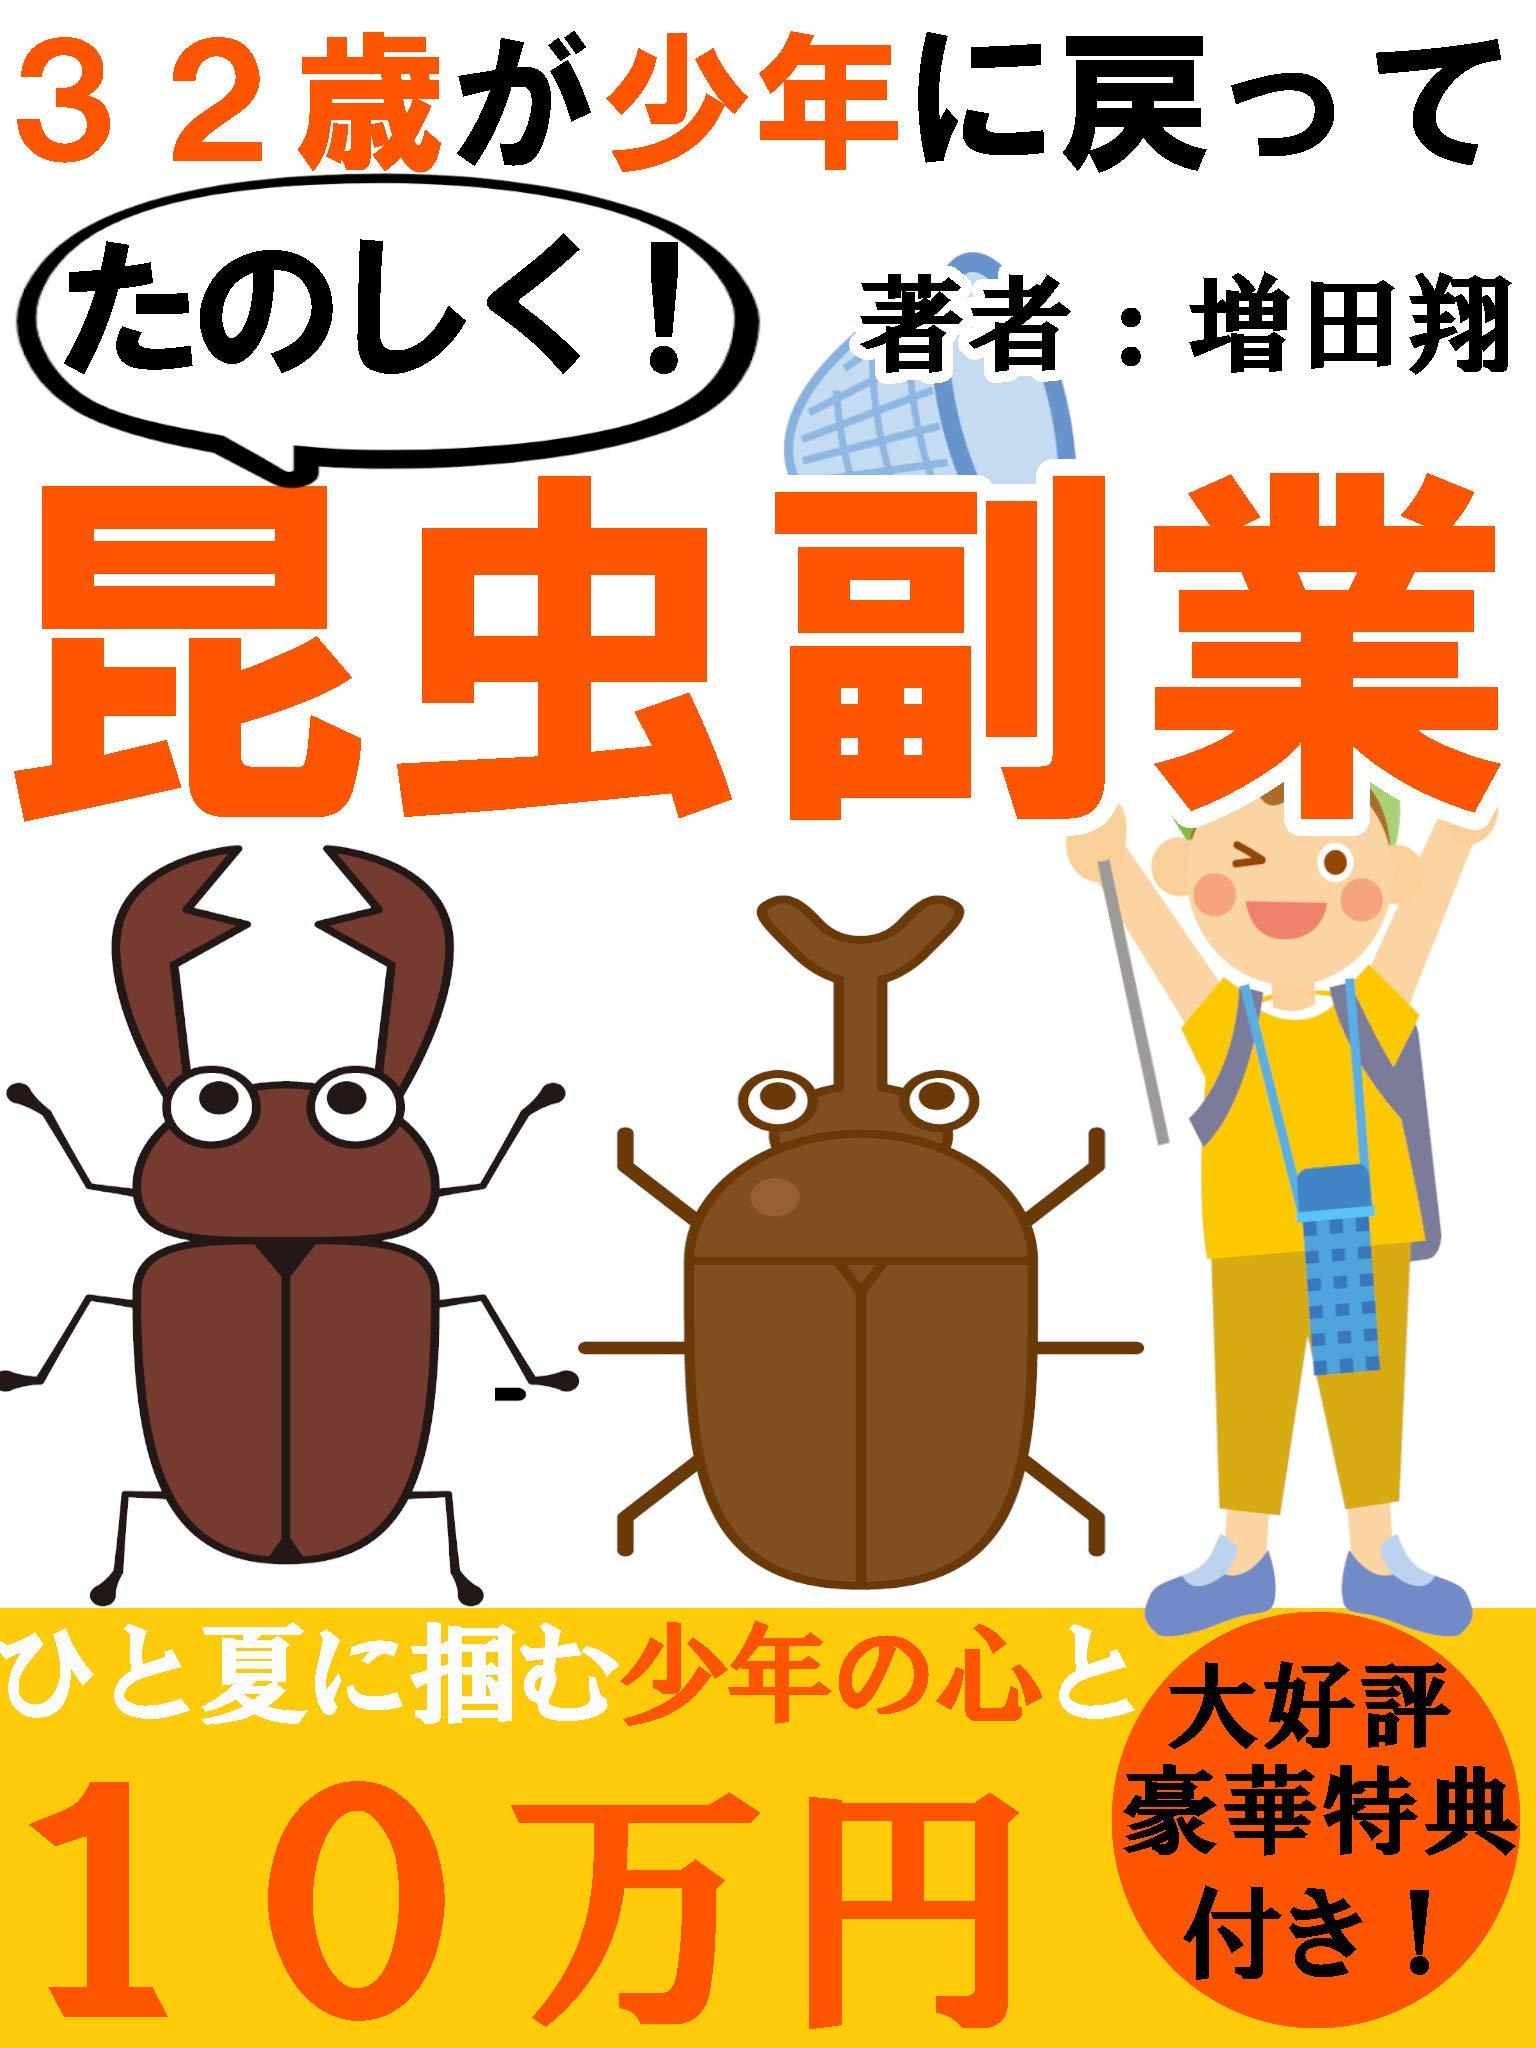 sannzyuunisaigasyounennnimodottekonntyuuhukugyou (Japanese Edition)